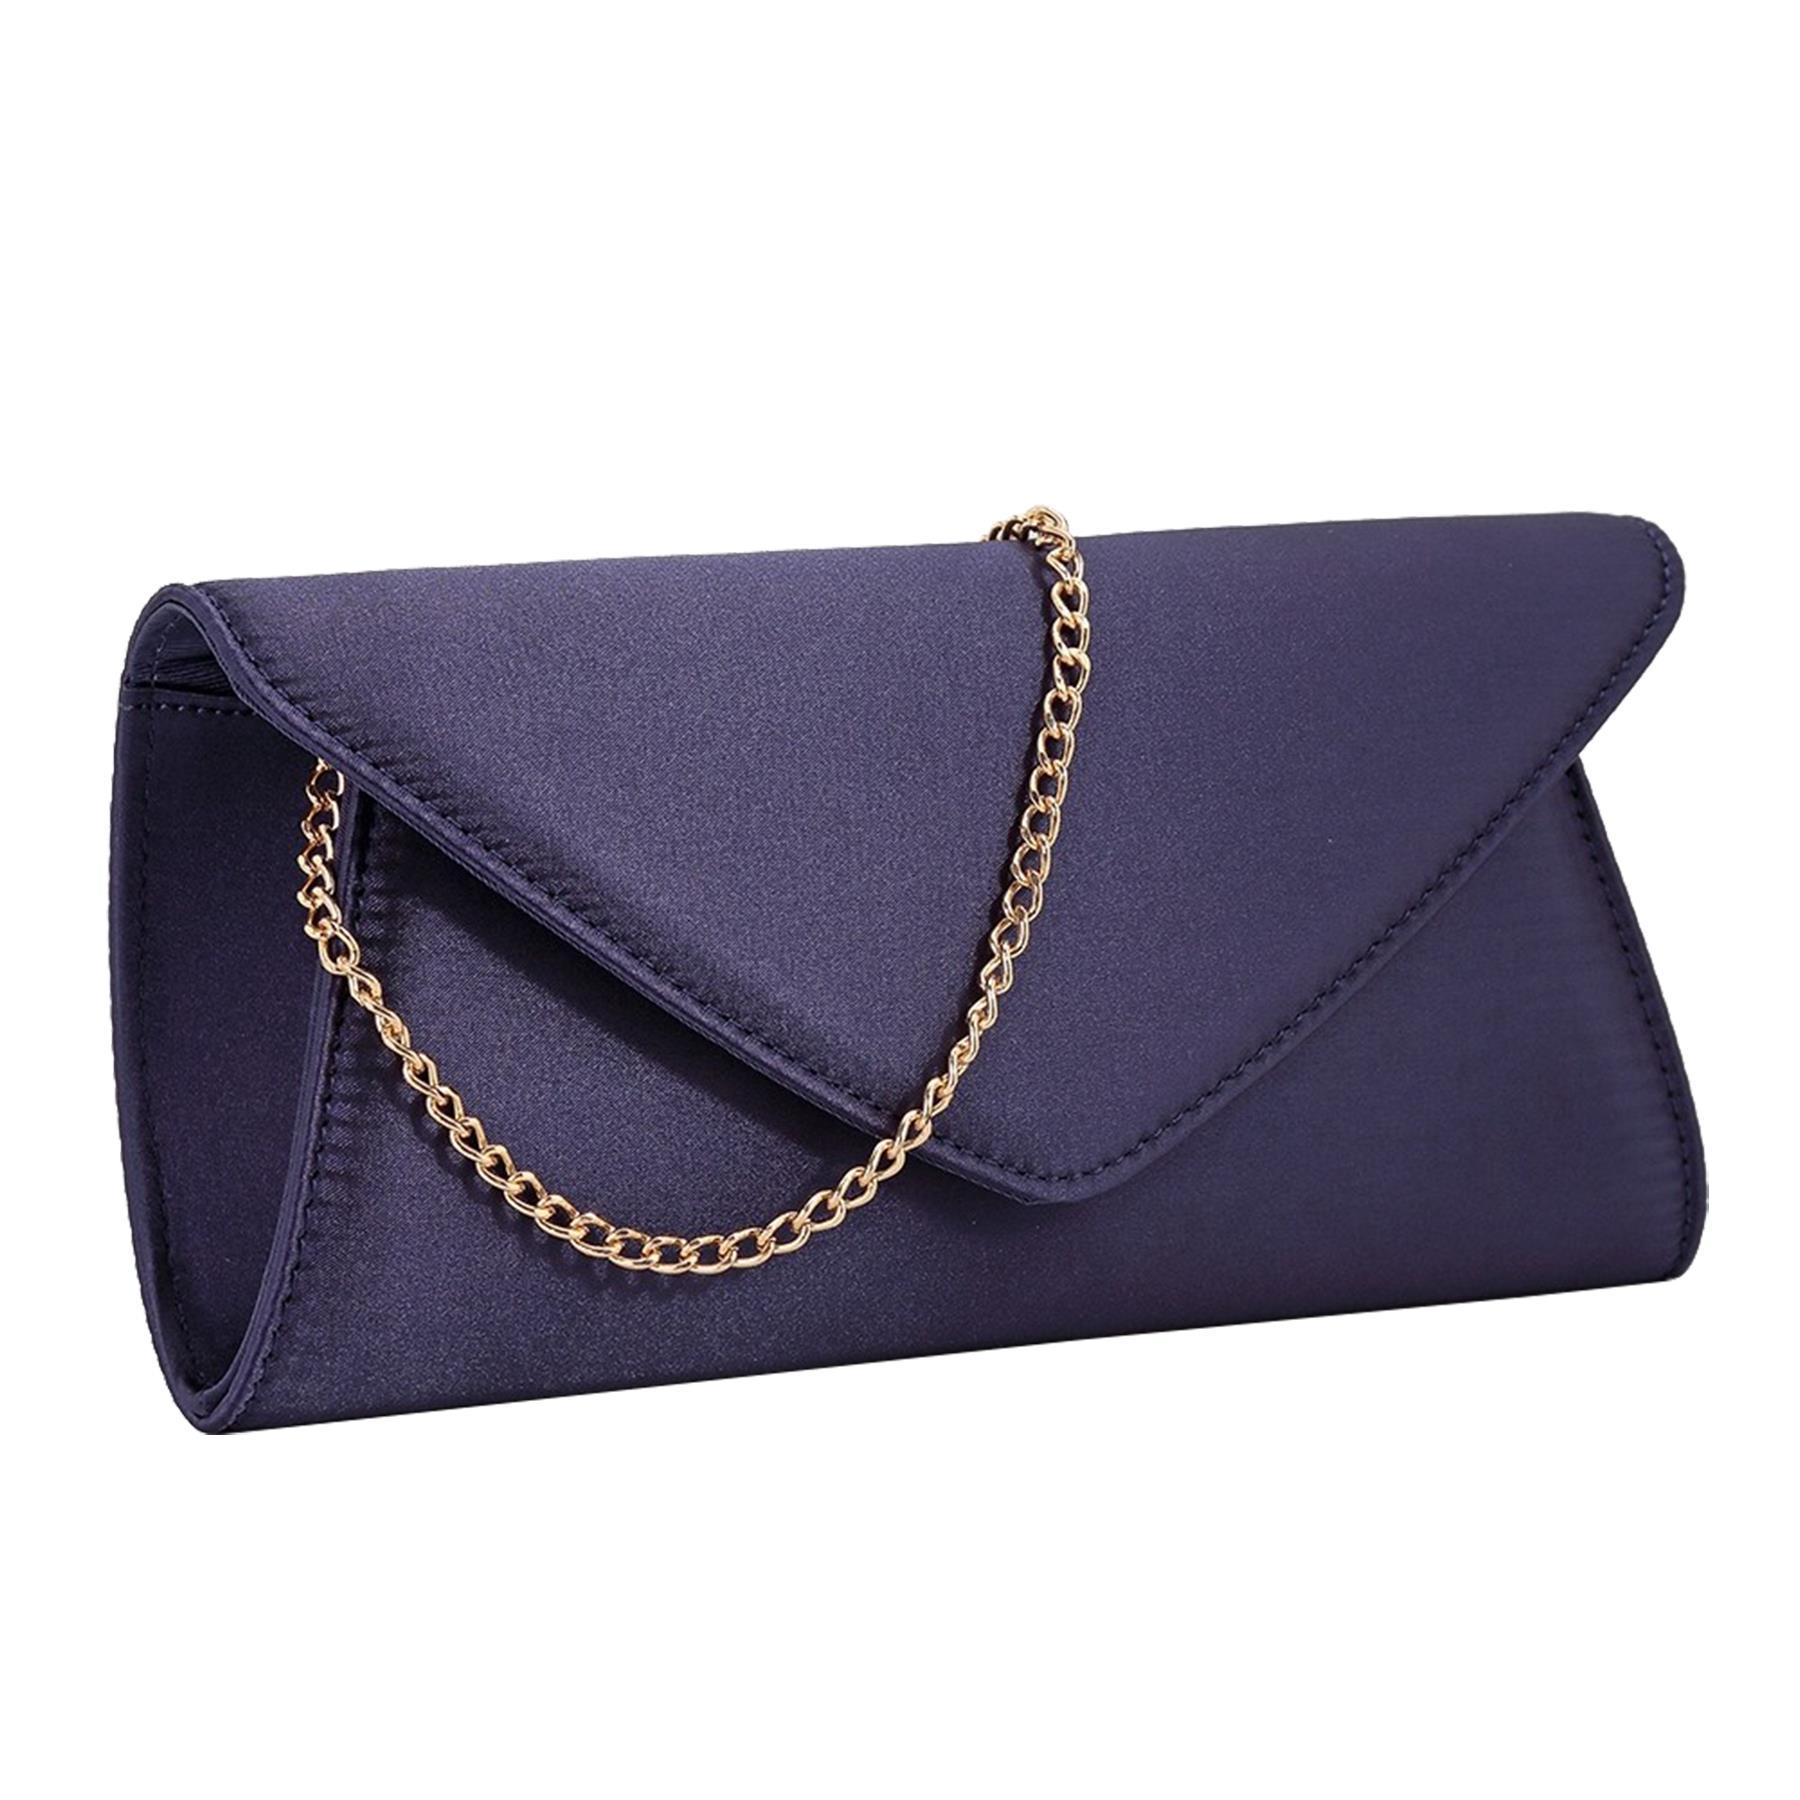 New-Ladies-Stylish-3D-Envelope-Satin-Prom-Party-Clutch-Bag-Purse thumbnail 6